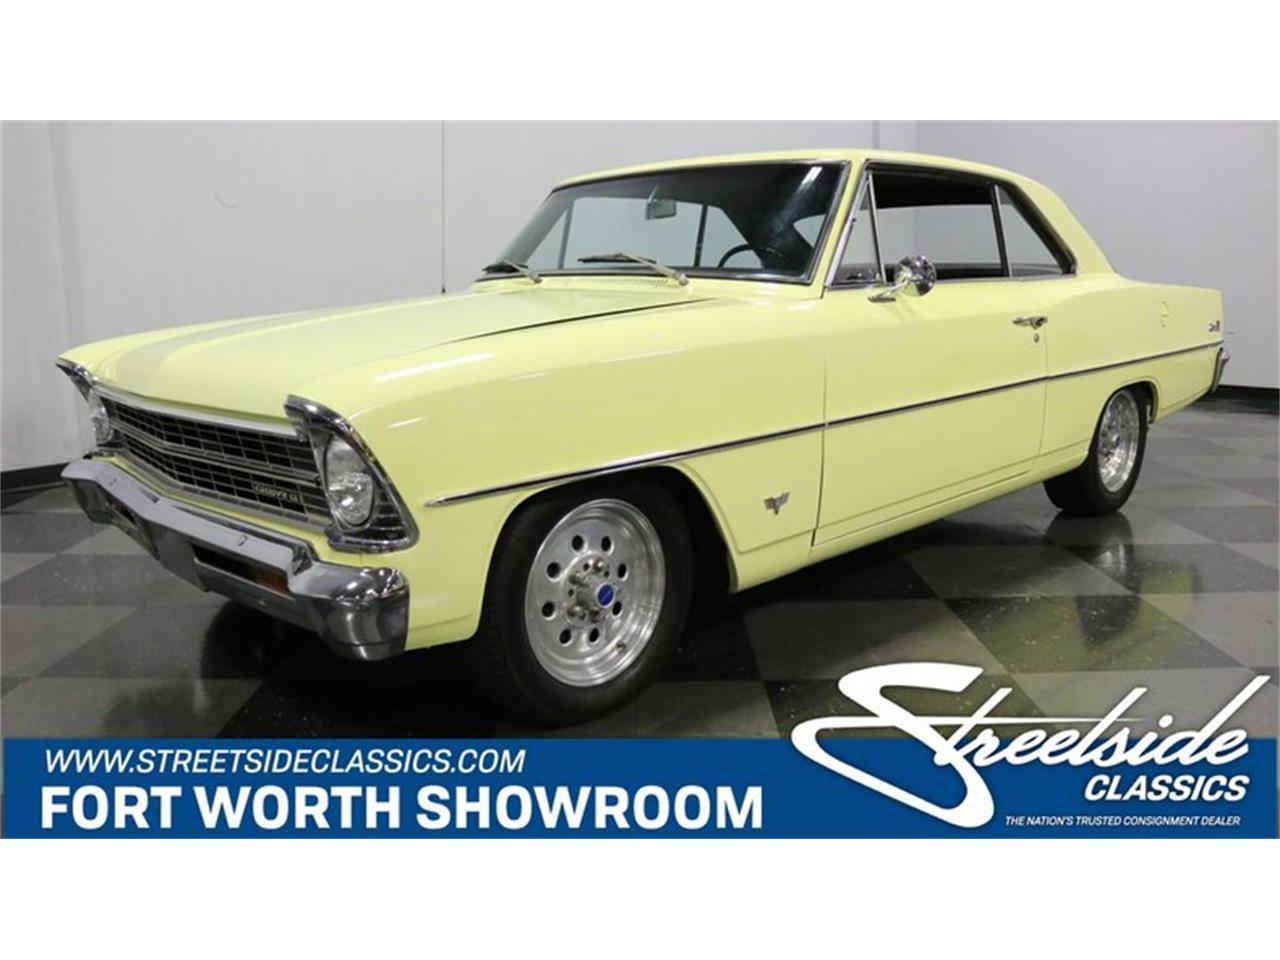 For Sale: 1967 Chevrolet Nova in Ft Worth, Texas